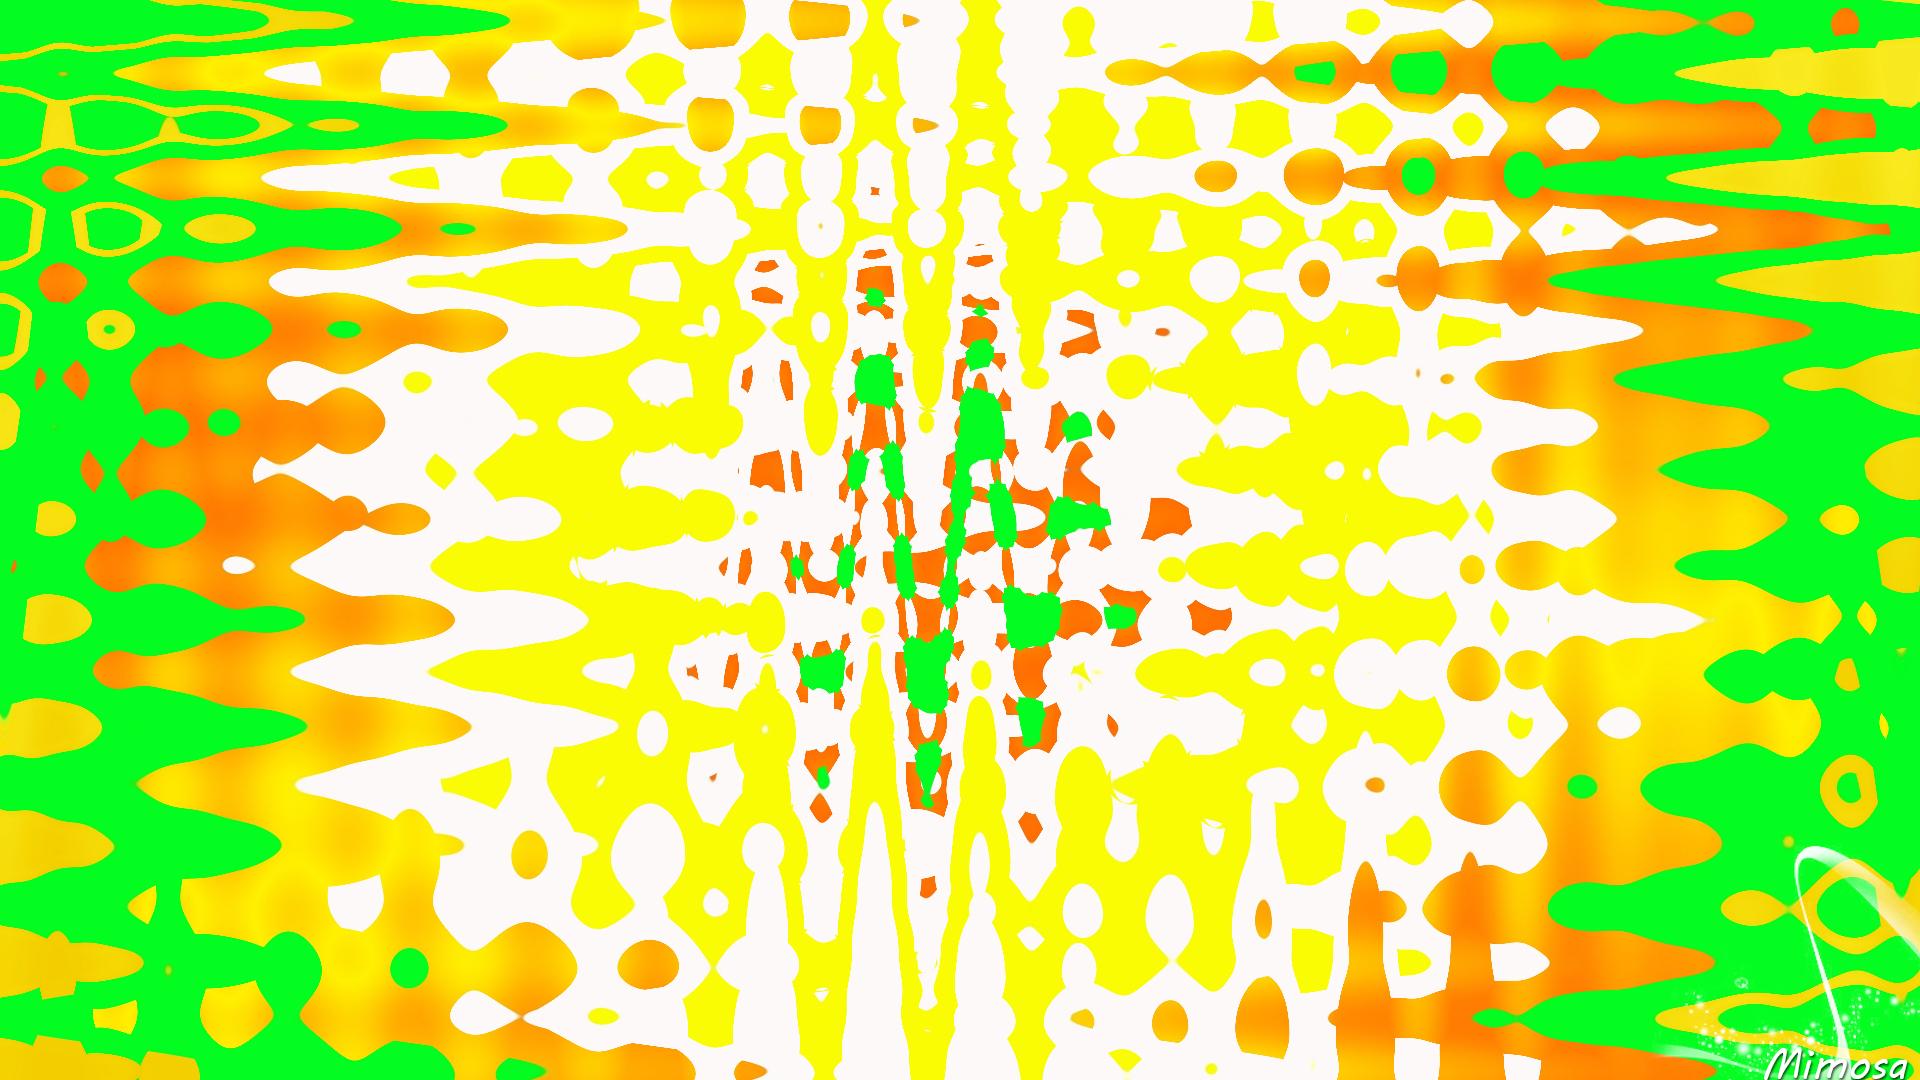 Artistic Colorful Colors Digital Art Green White Yellow Orange Color 1920x1080